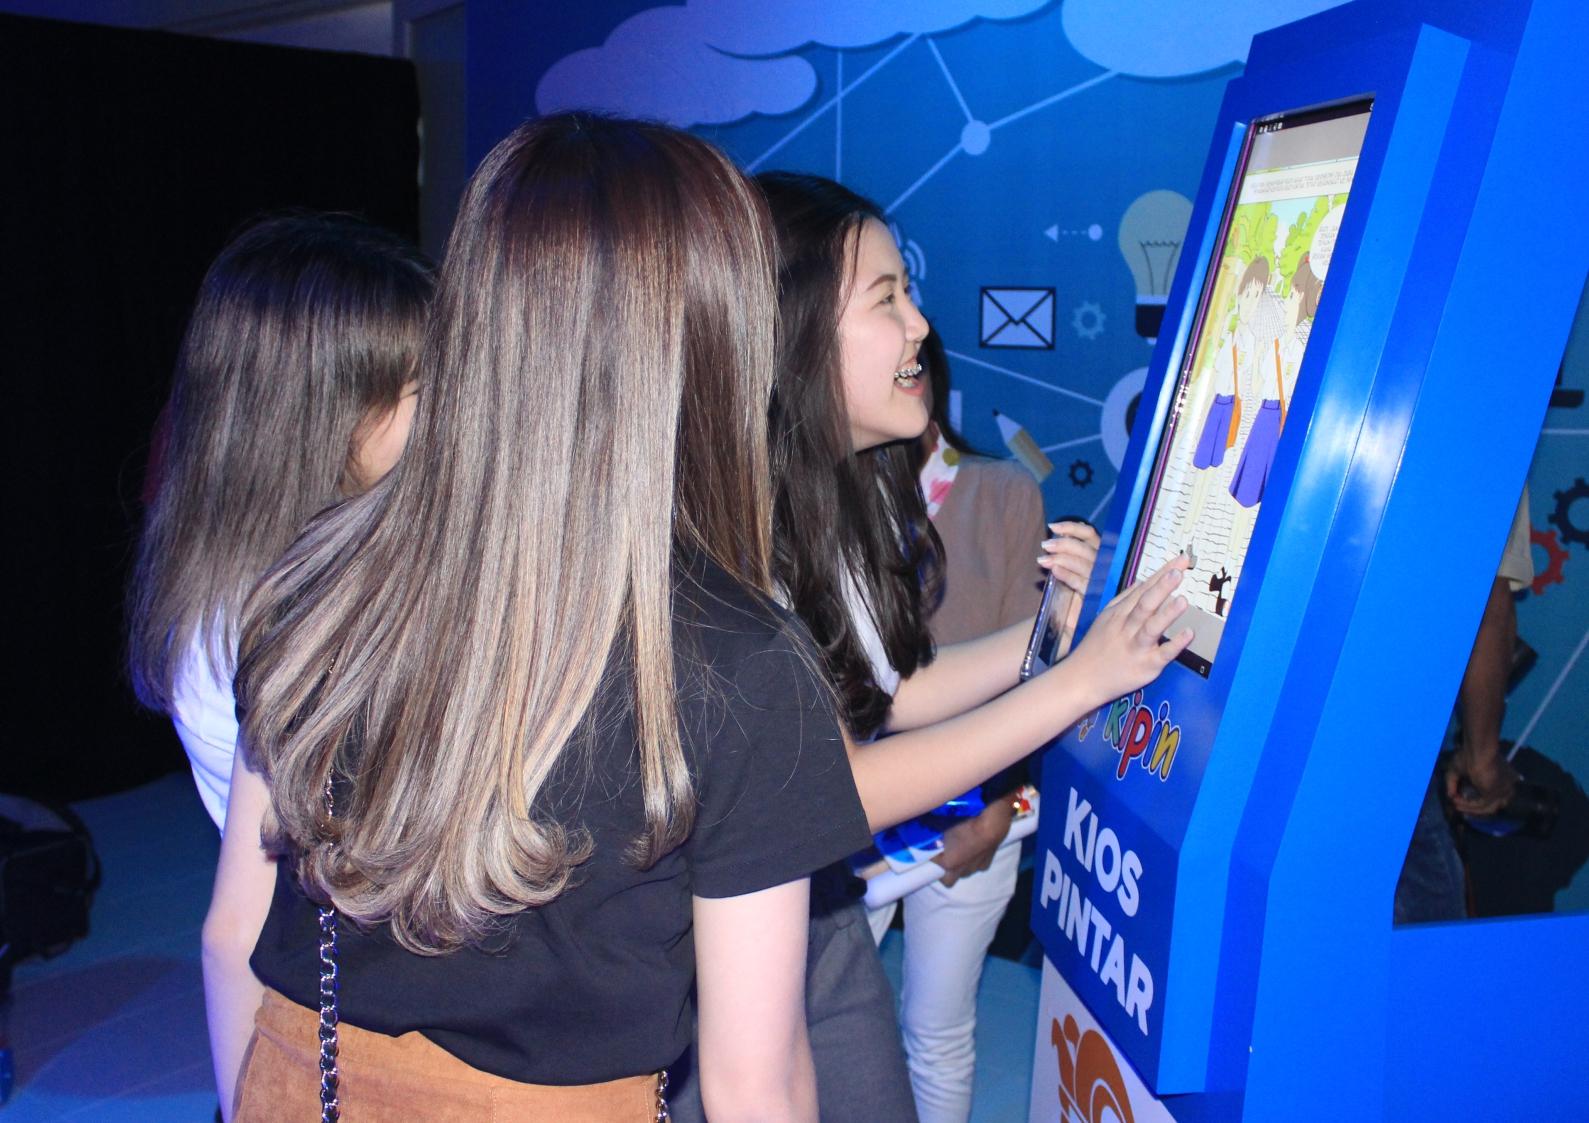 education technology media pembelajaran digital